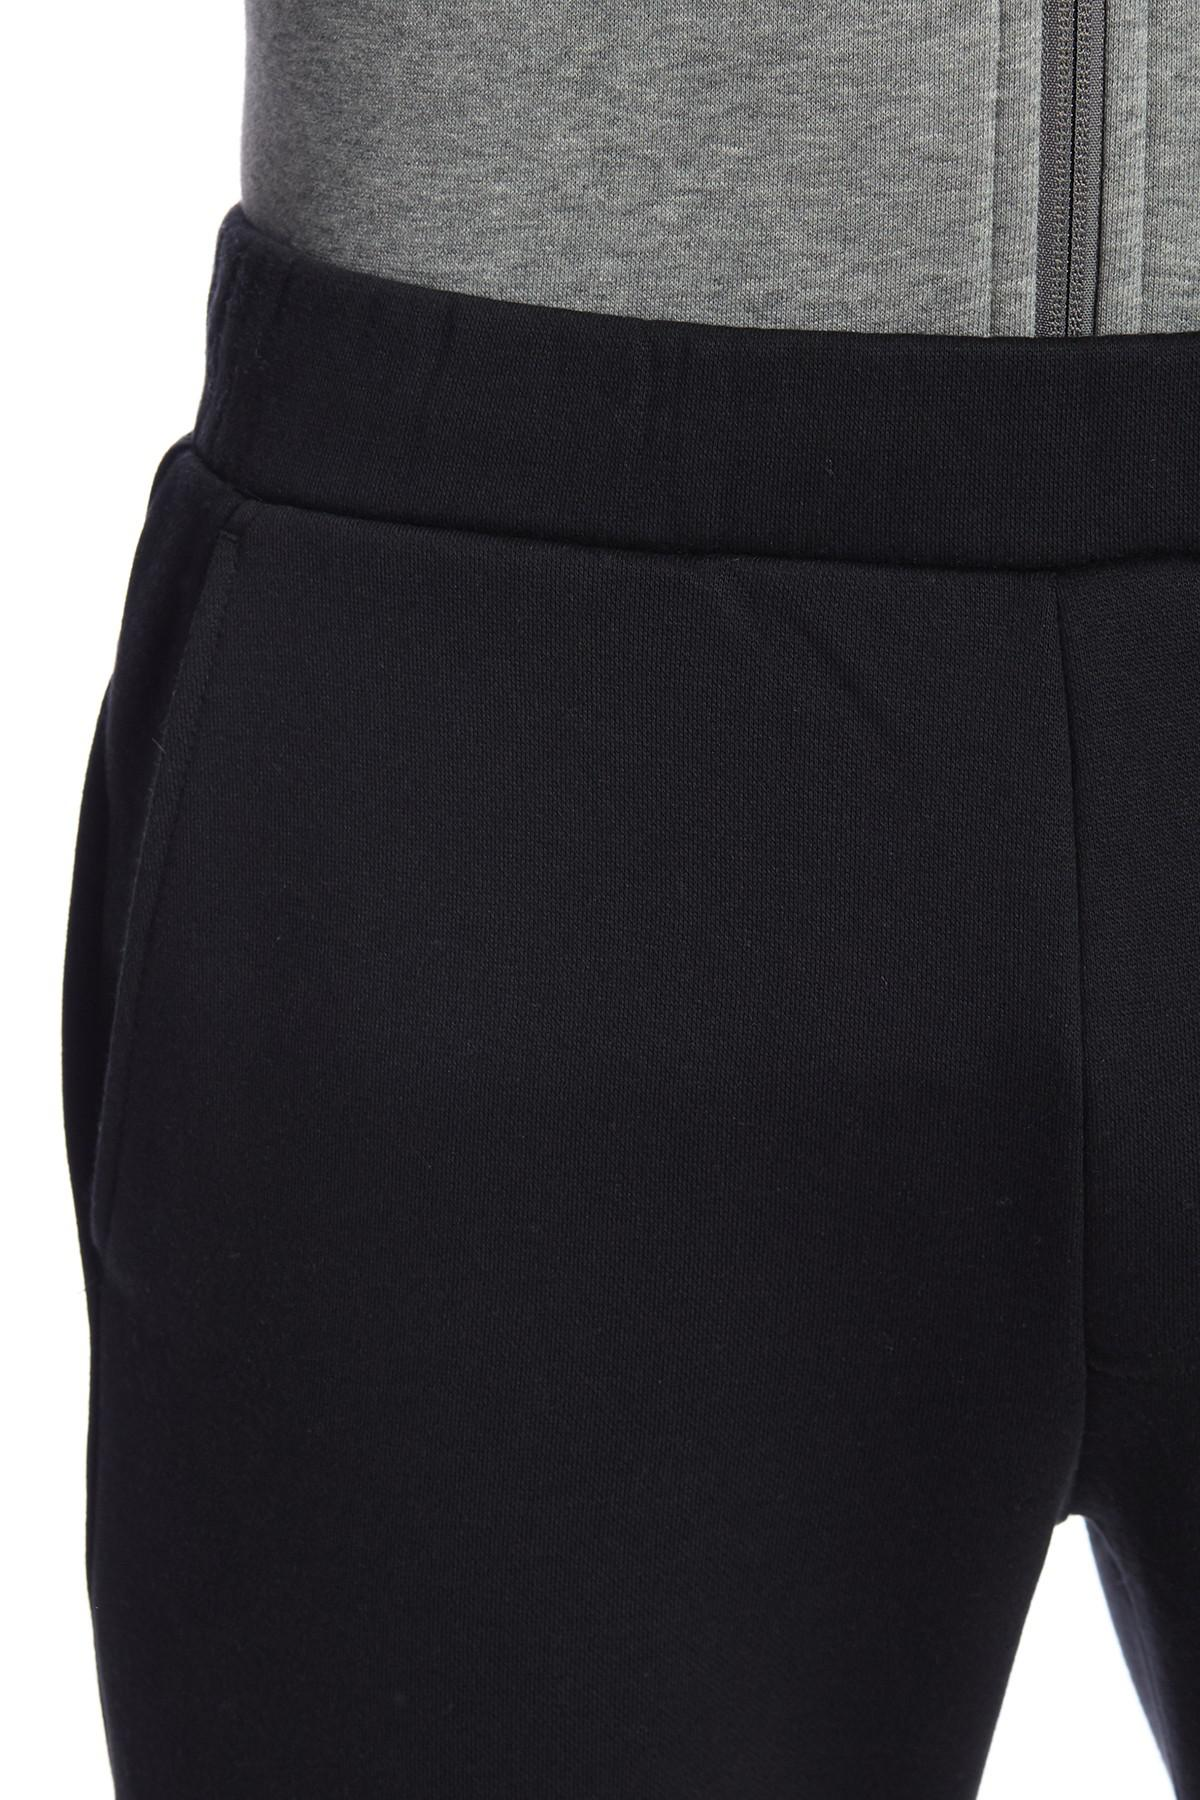 4b3620feaa17 Lyst - PUMA Rebel Logo Print Sweatpants in Black for Men